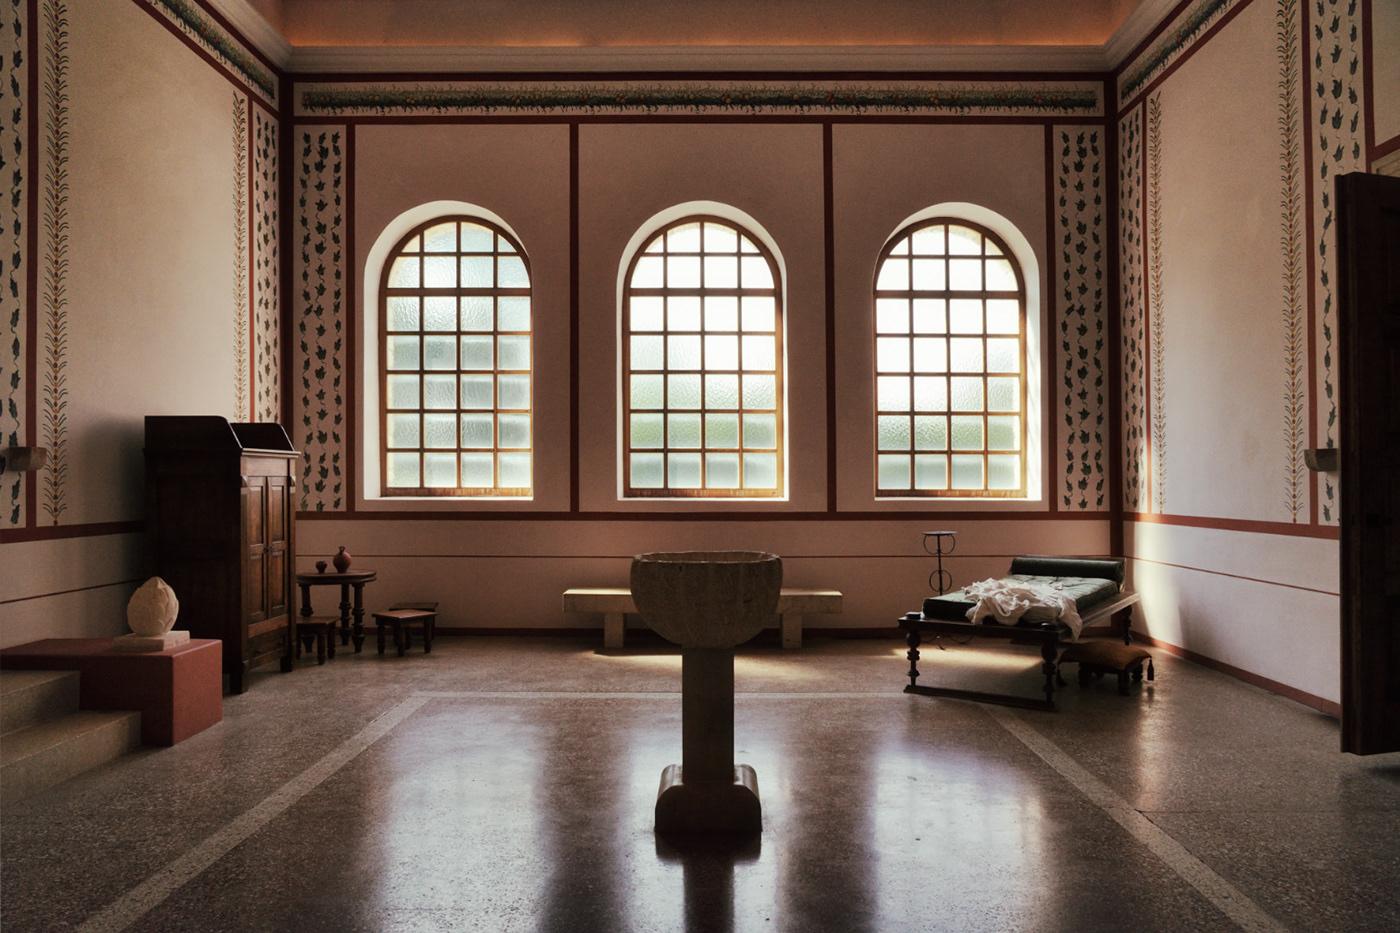 Image may contain: indoor, window and floor